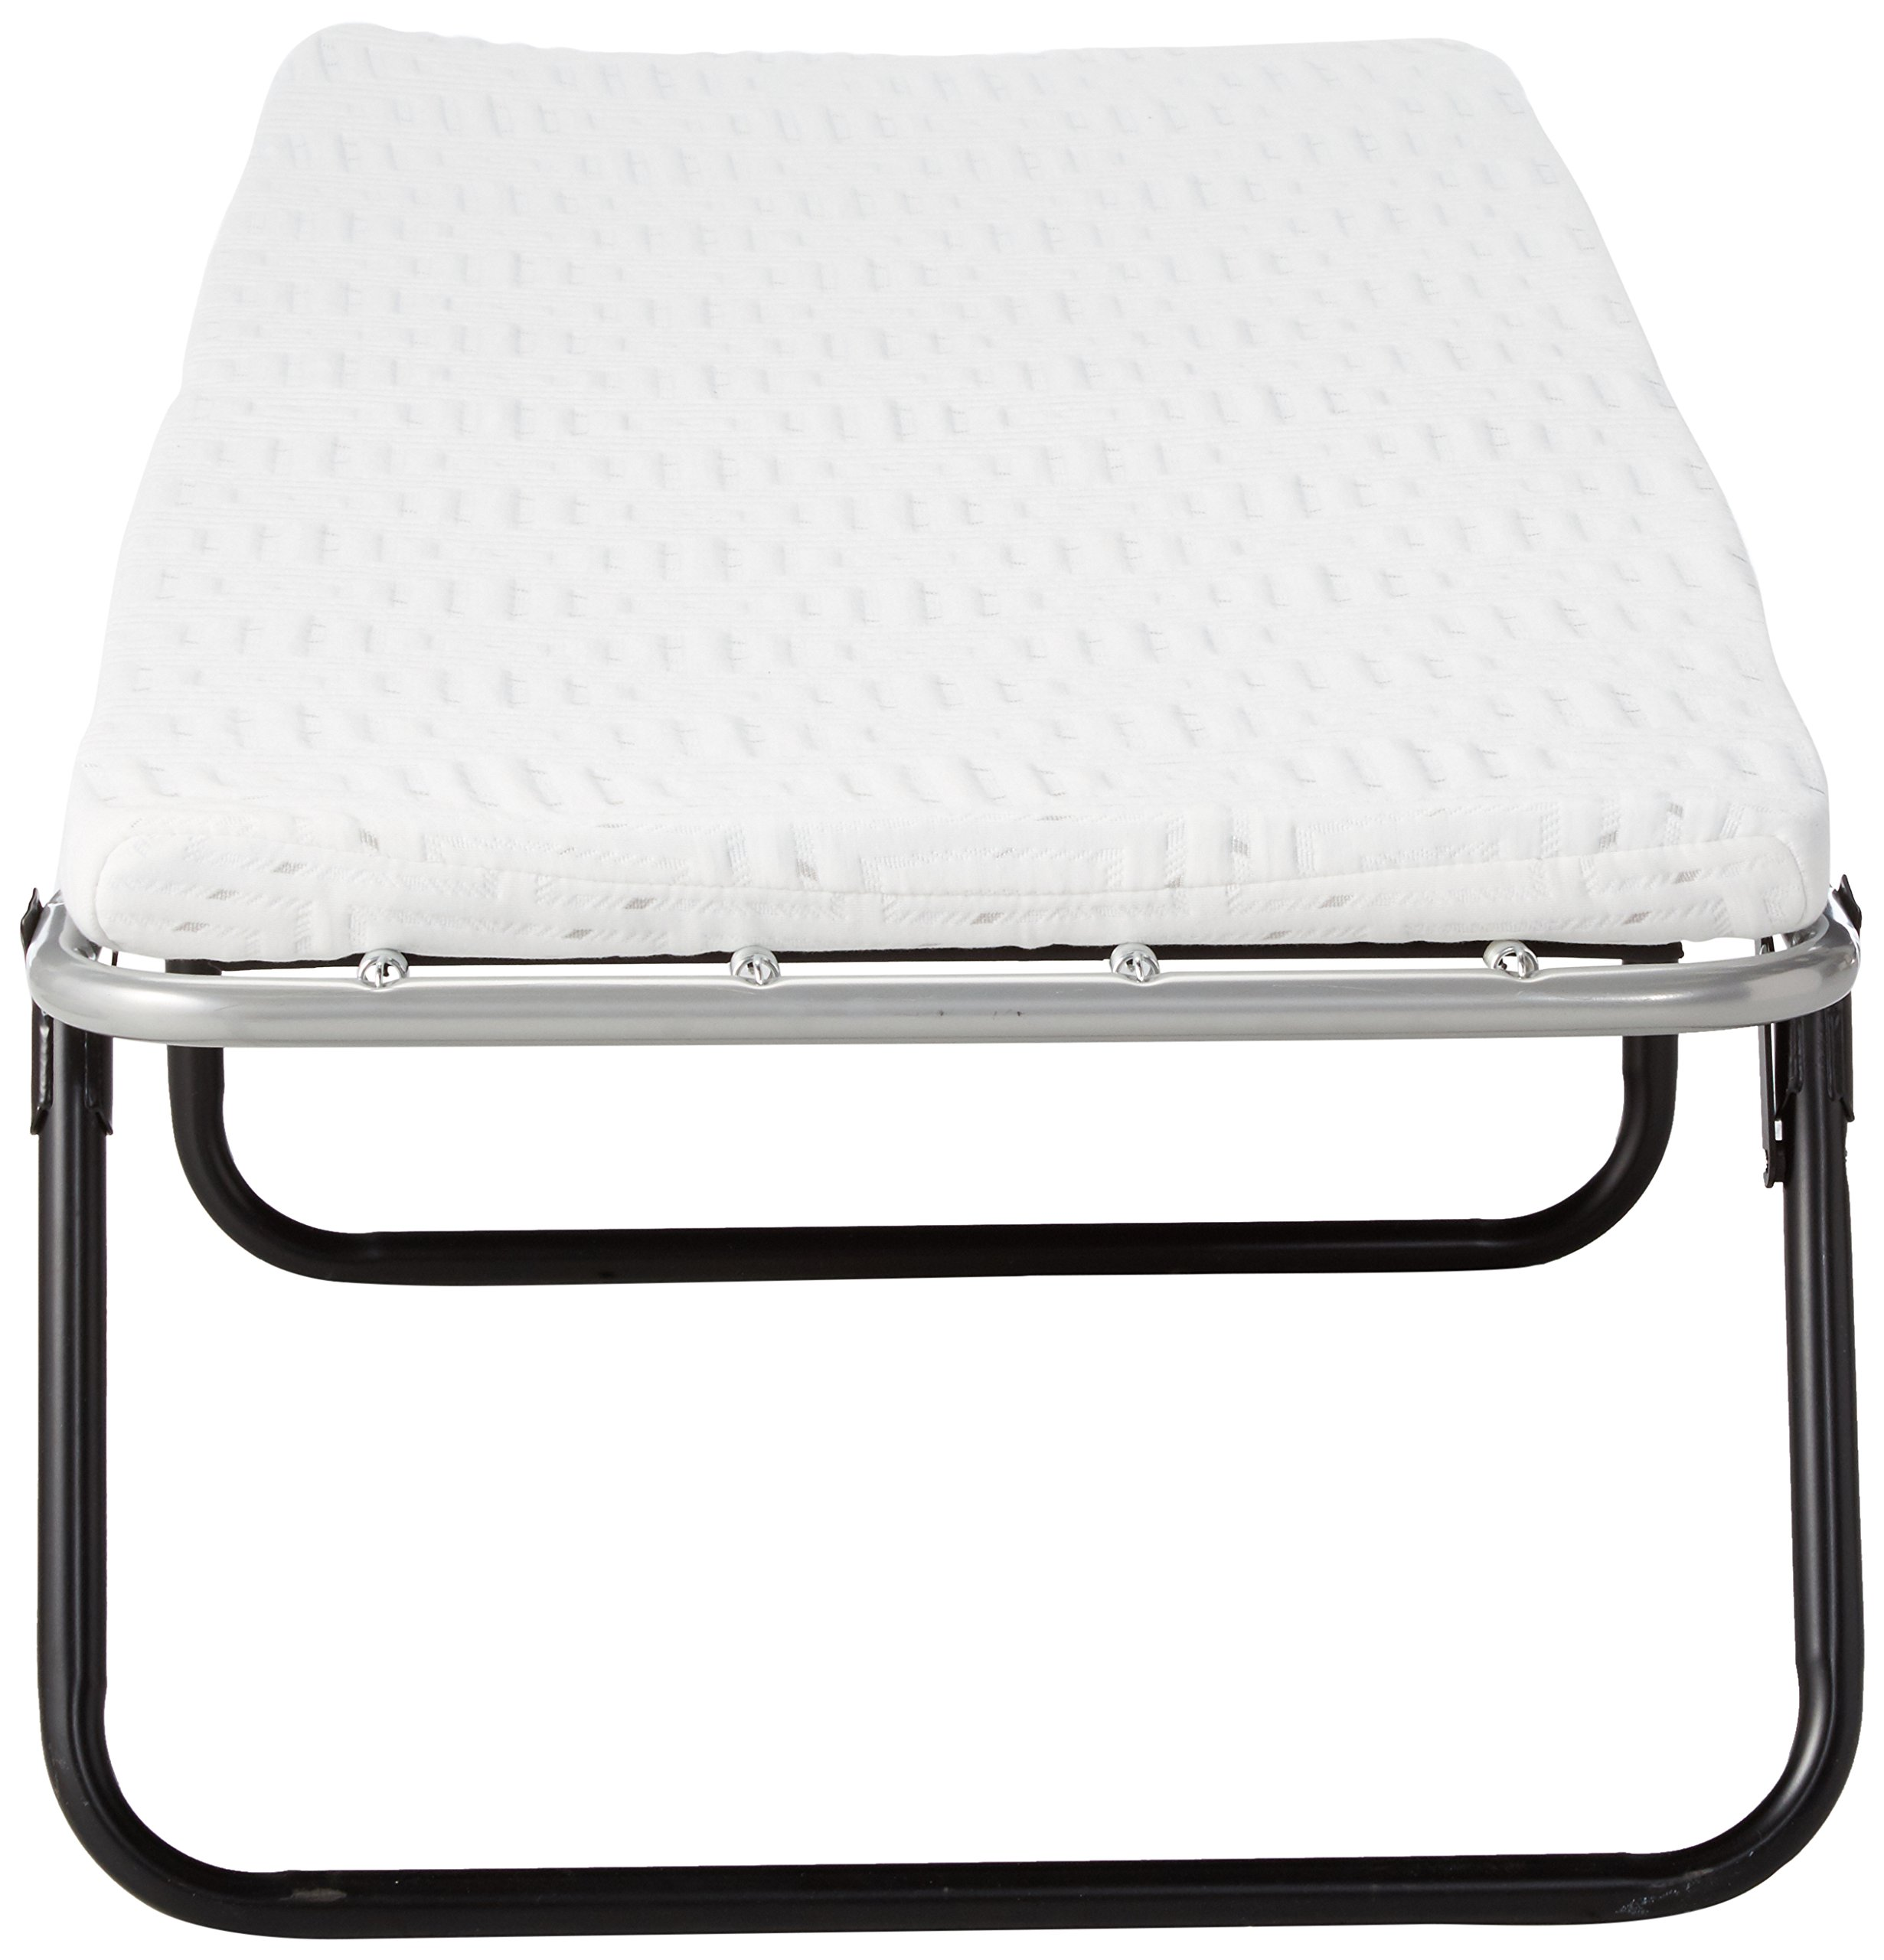 Broyhill Foldaway Guest Bed: Folding Steel Frame with Gel Memory Foam Mattress, 2'' Single by Broyhill